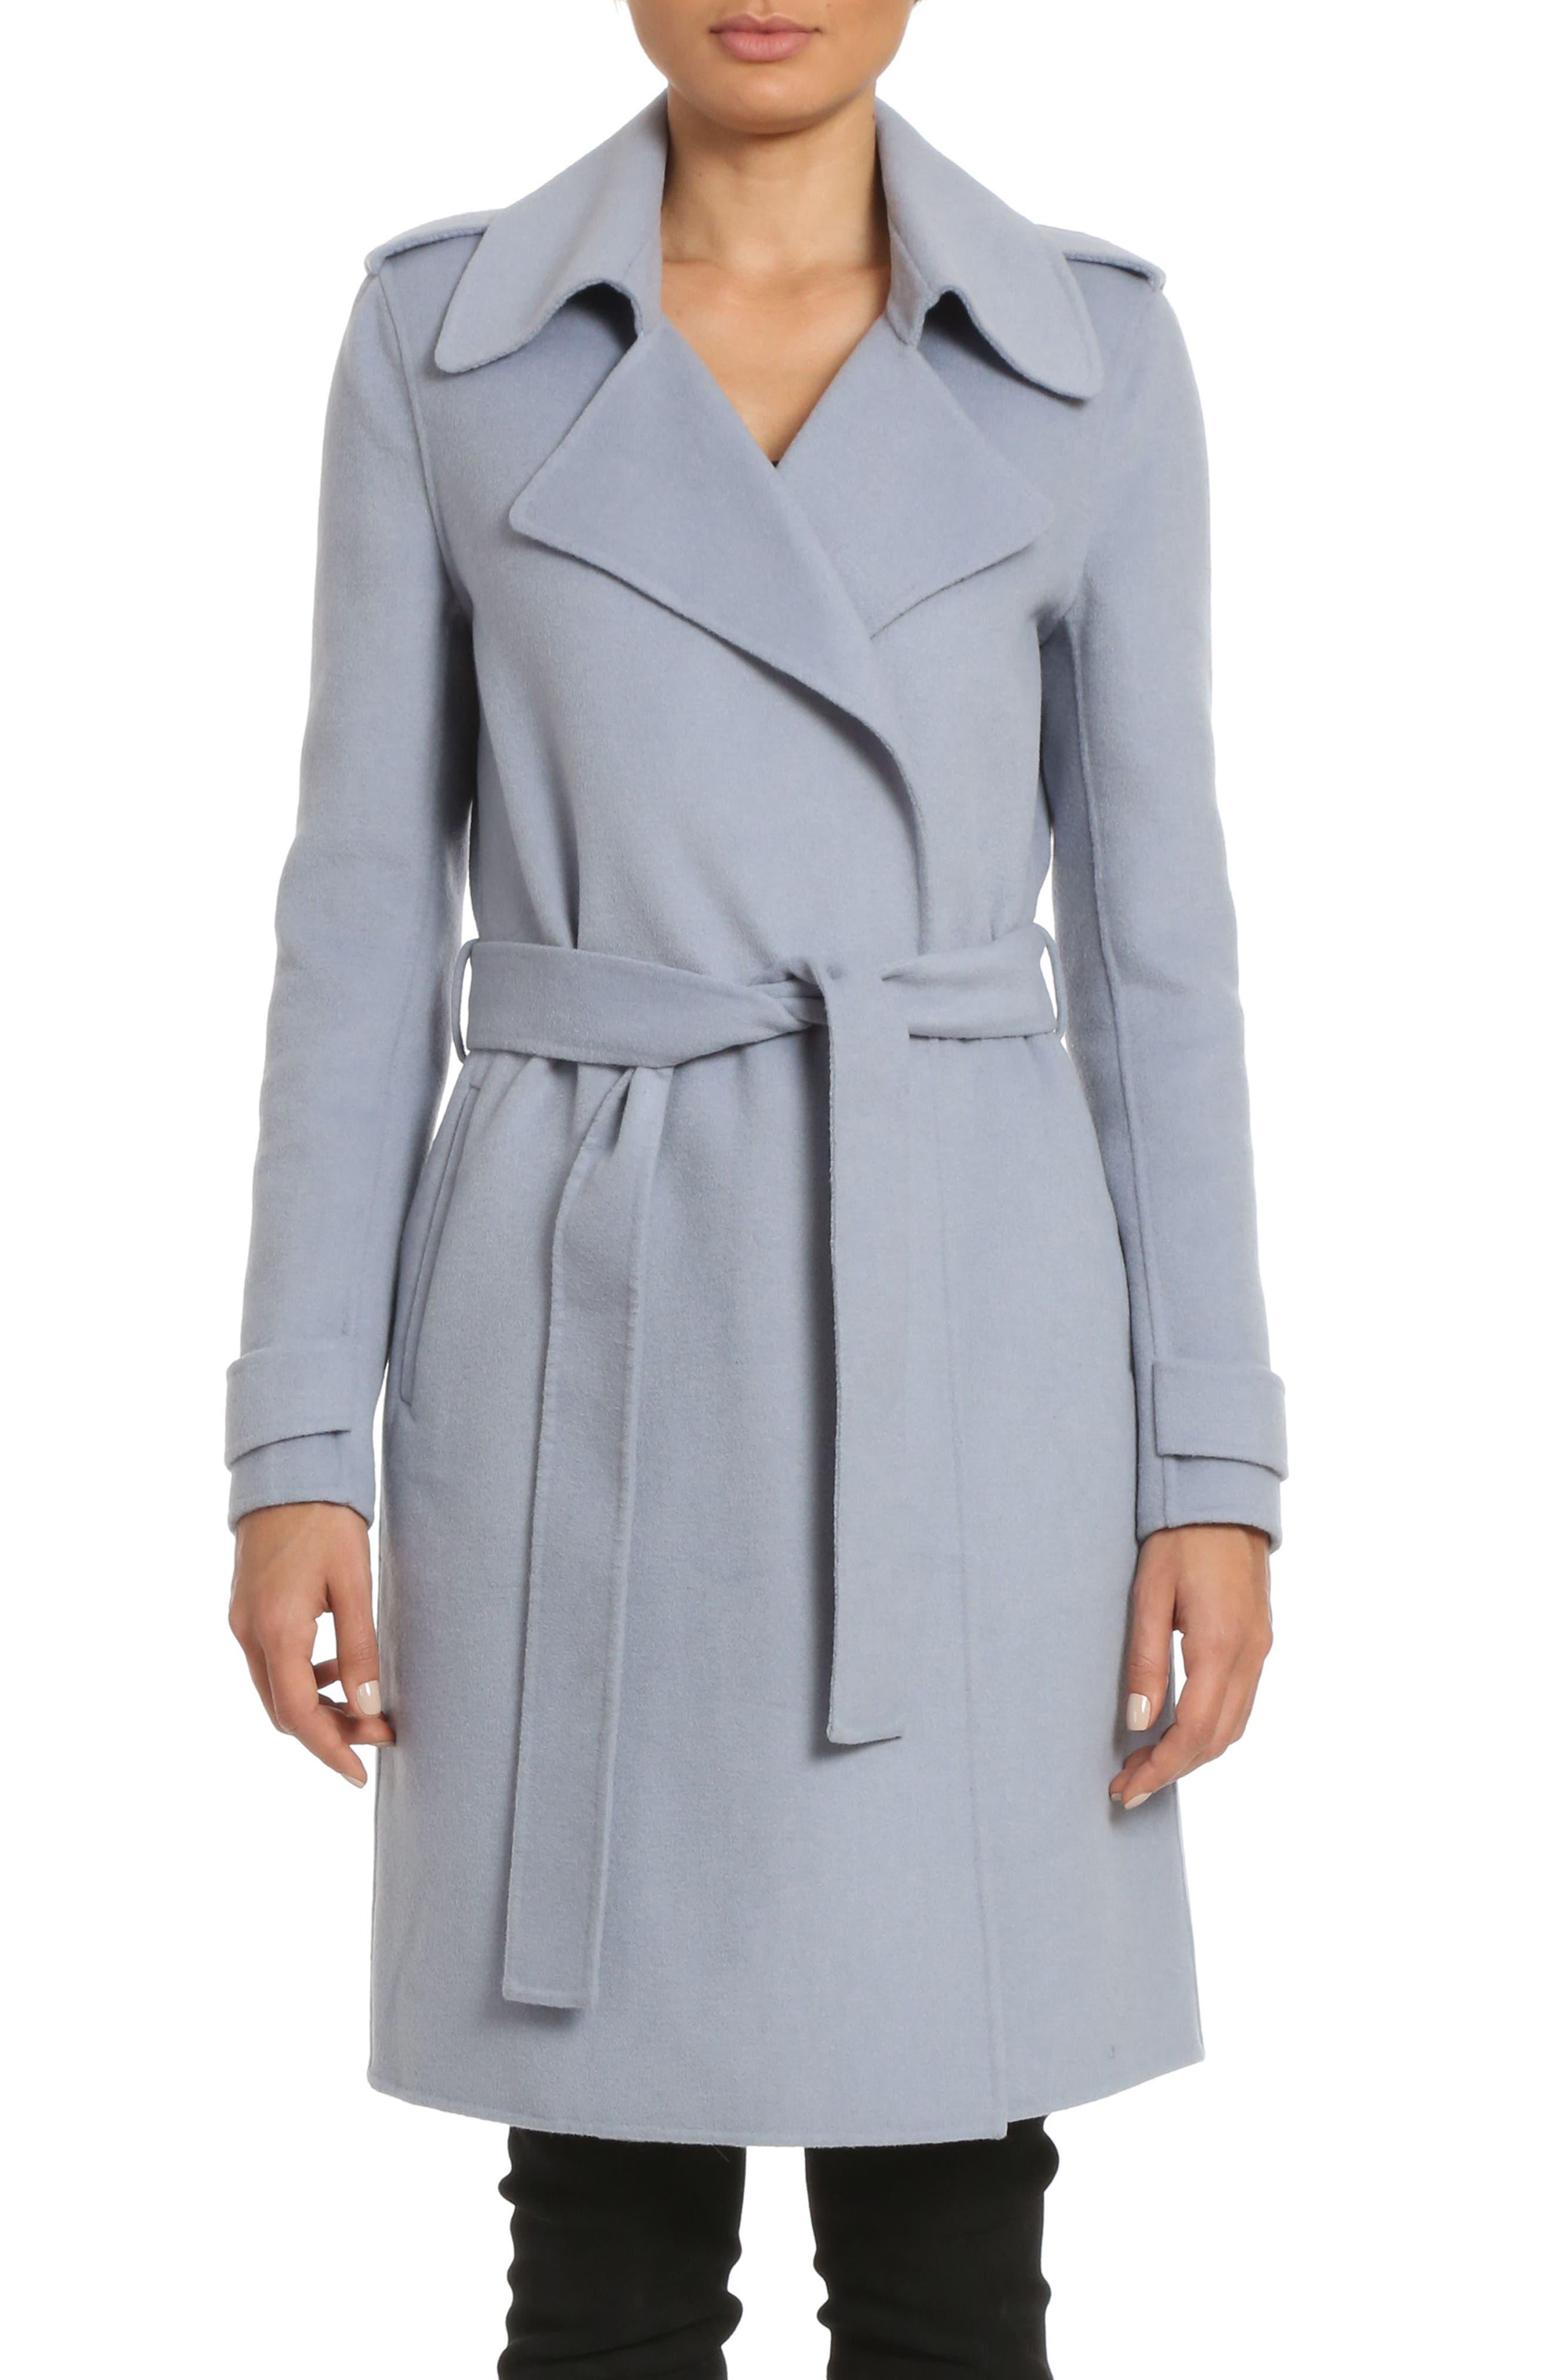 Alternate Image 1 Selected - Badgley Mischka Alexis Double Face Wool Blend Long Wrap Coat